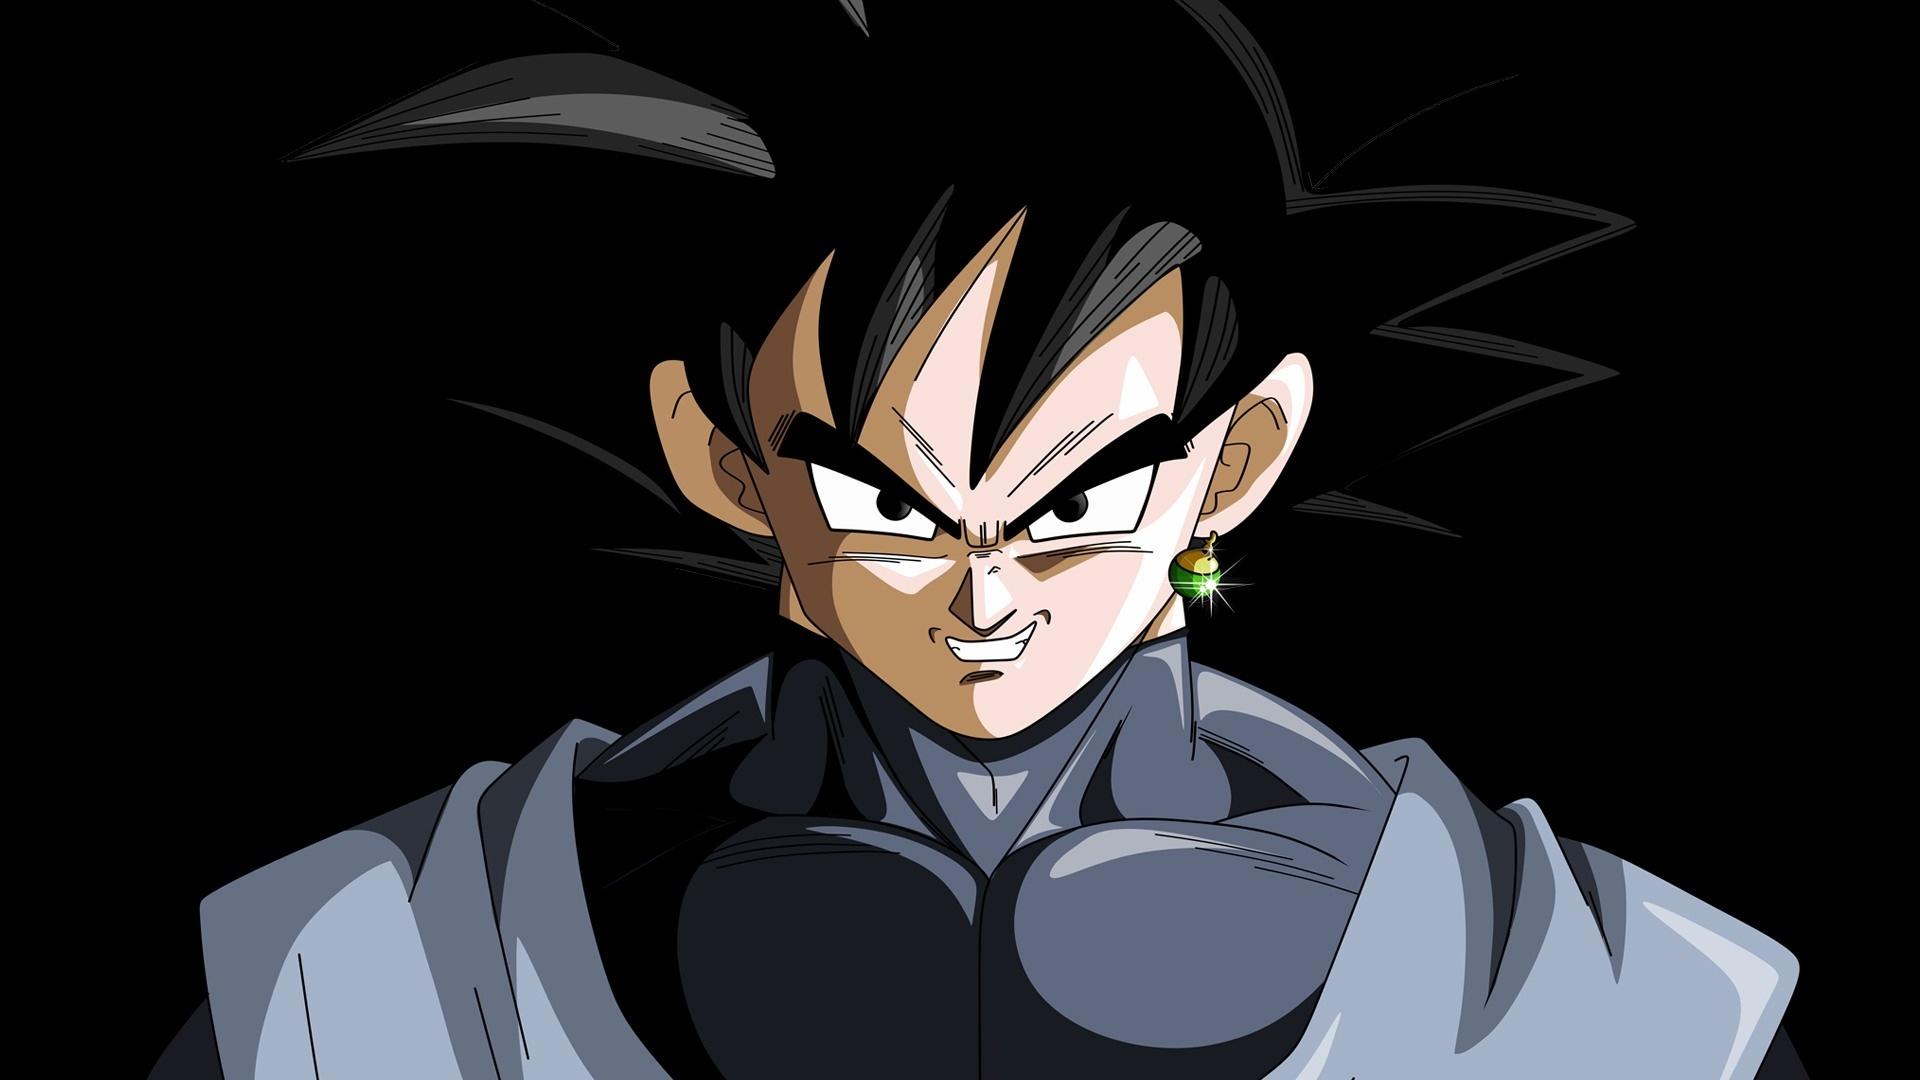 Goku Black windows background